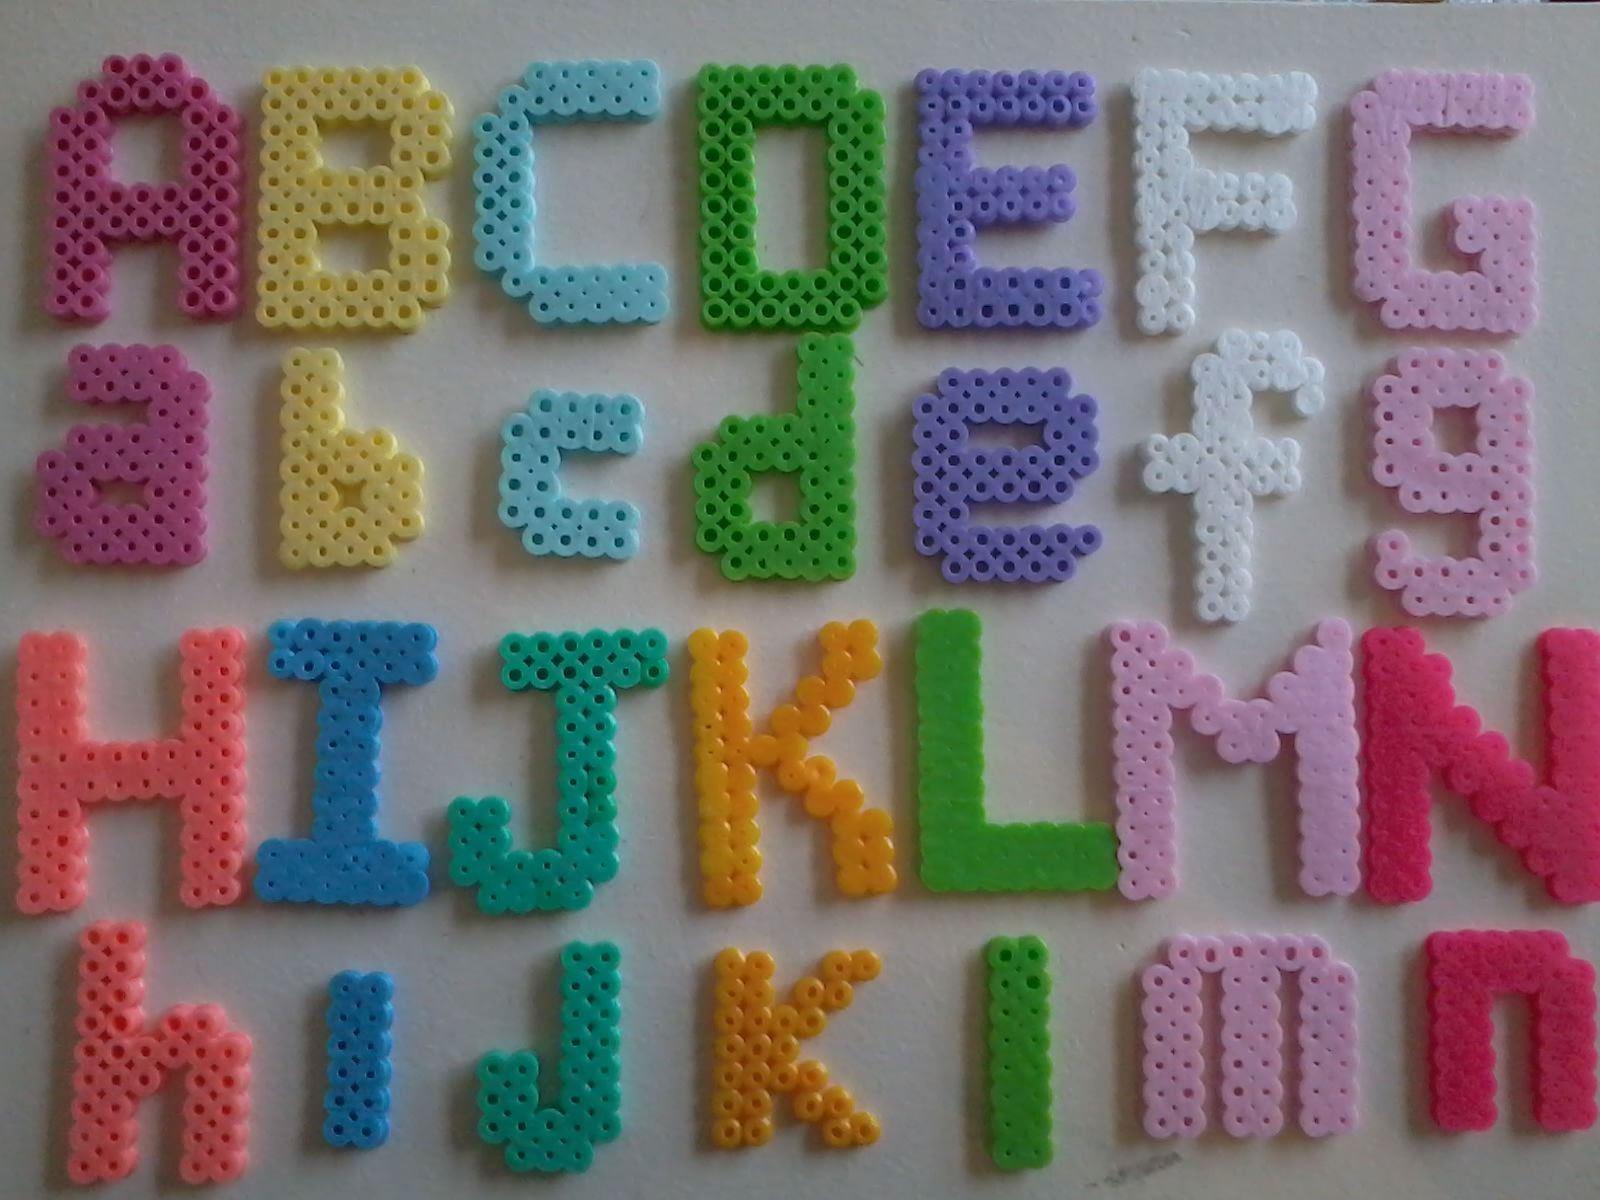 disney princess themed colored alphabet perlar hama